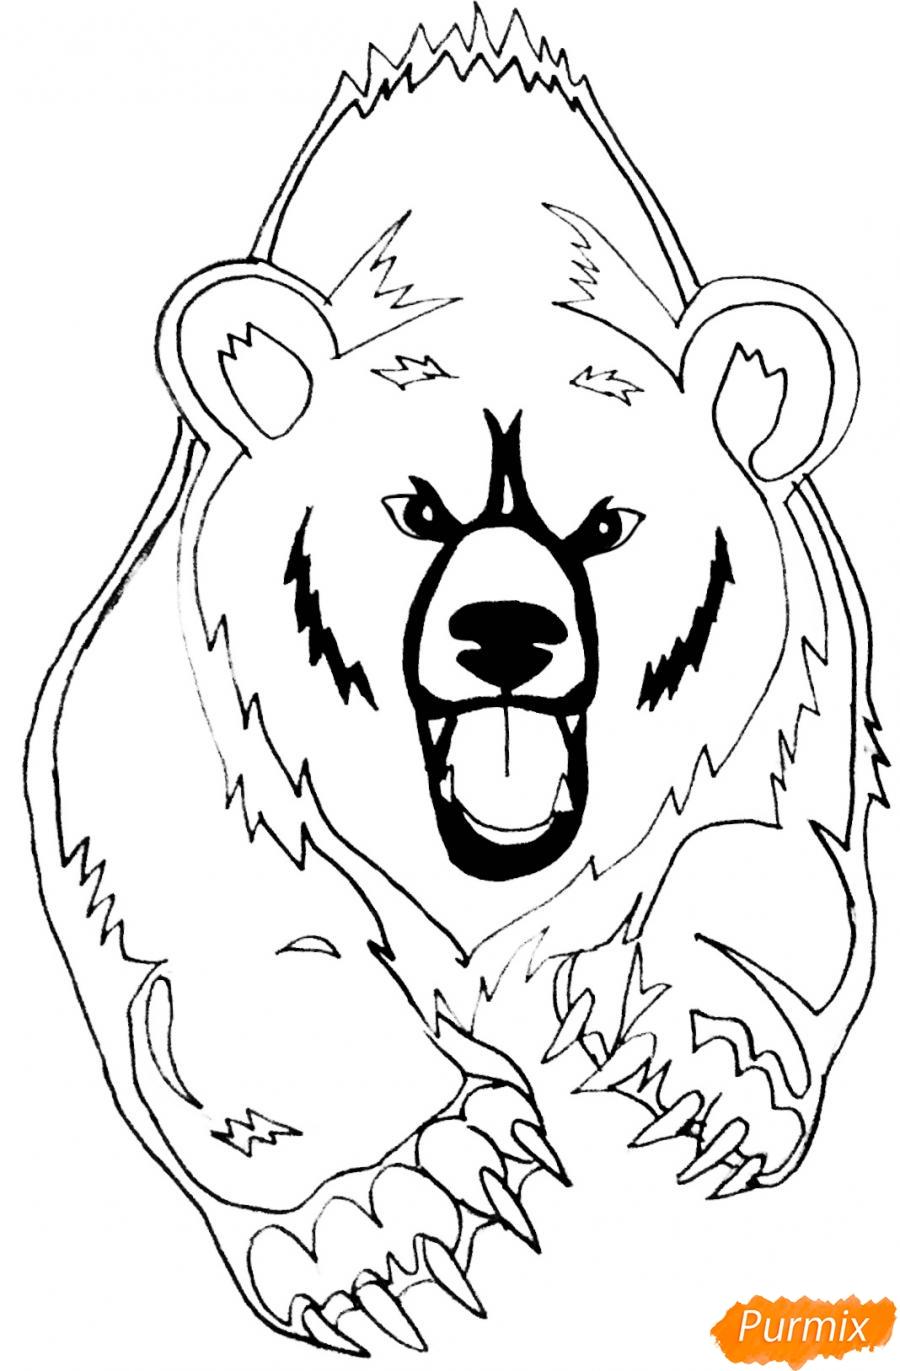 Рисуем медведя в стиле тату - шаг 8